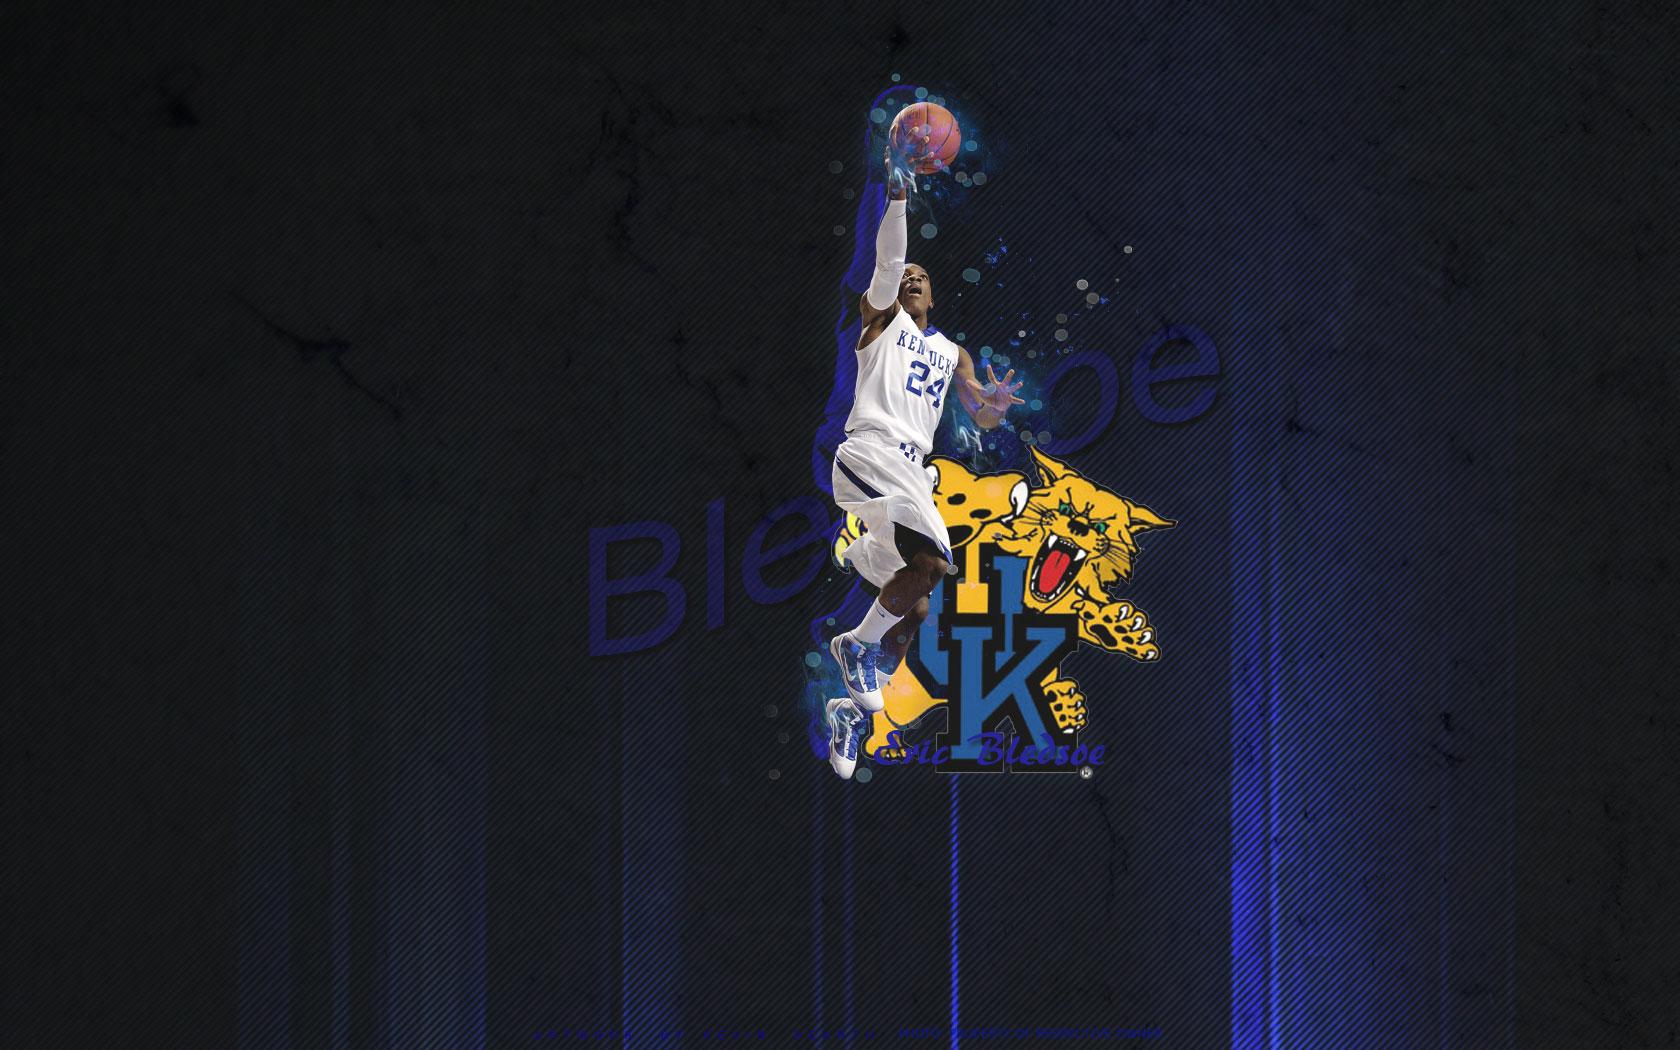 Kentucky Basketball Images Go Big Blue Hd Wallpaper And: Kentucky Wildcats Wallpapers (29 Wallpapers)